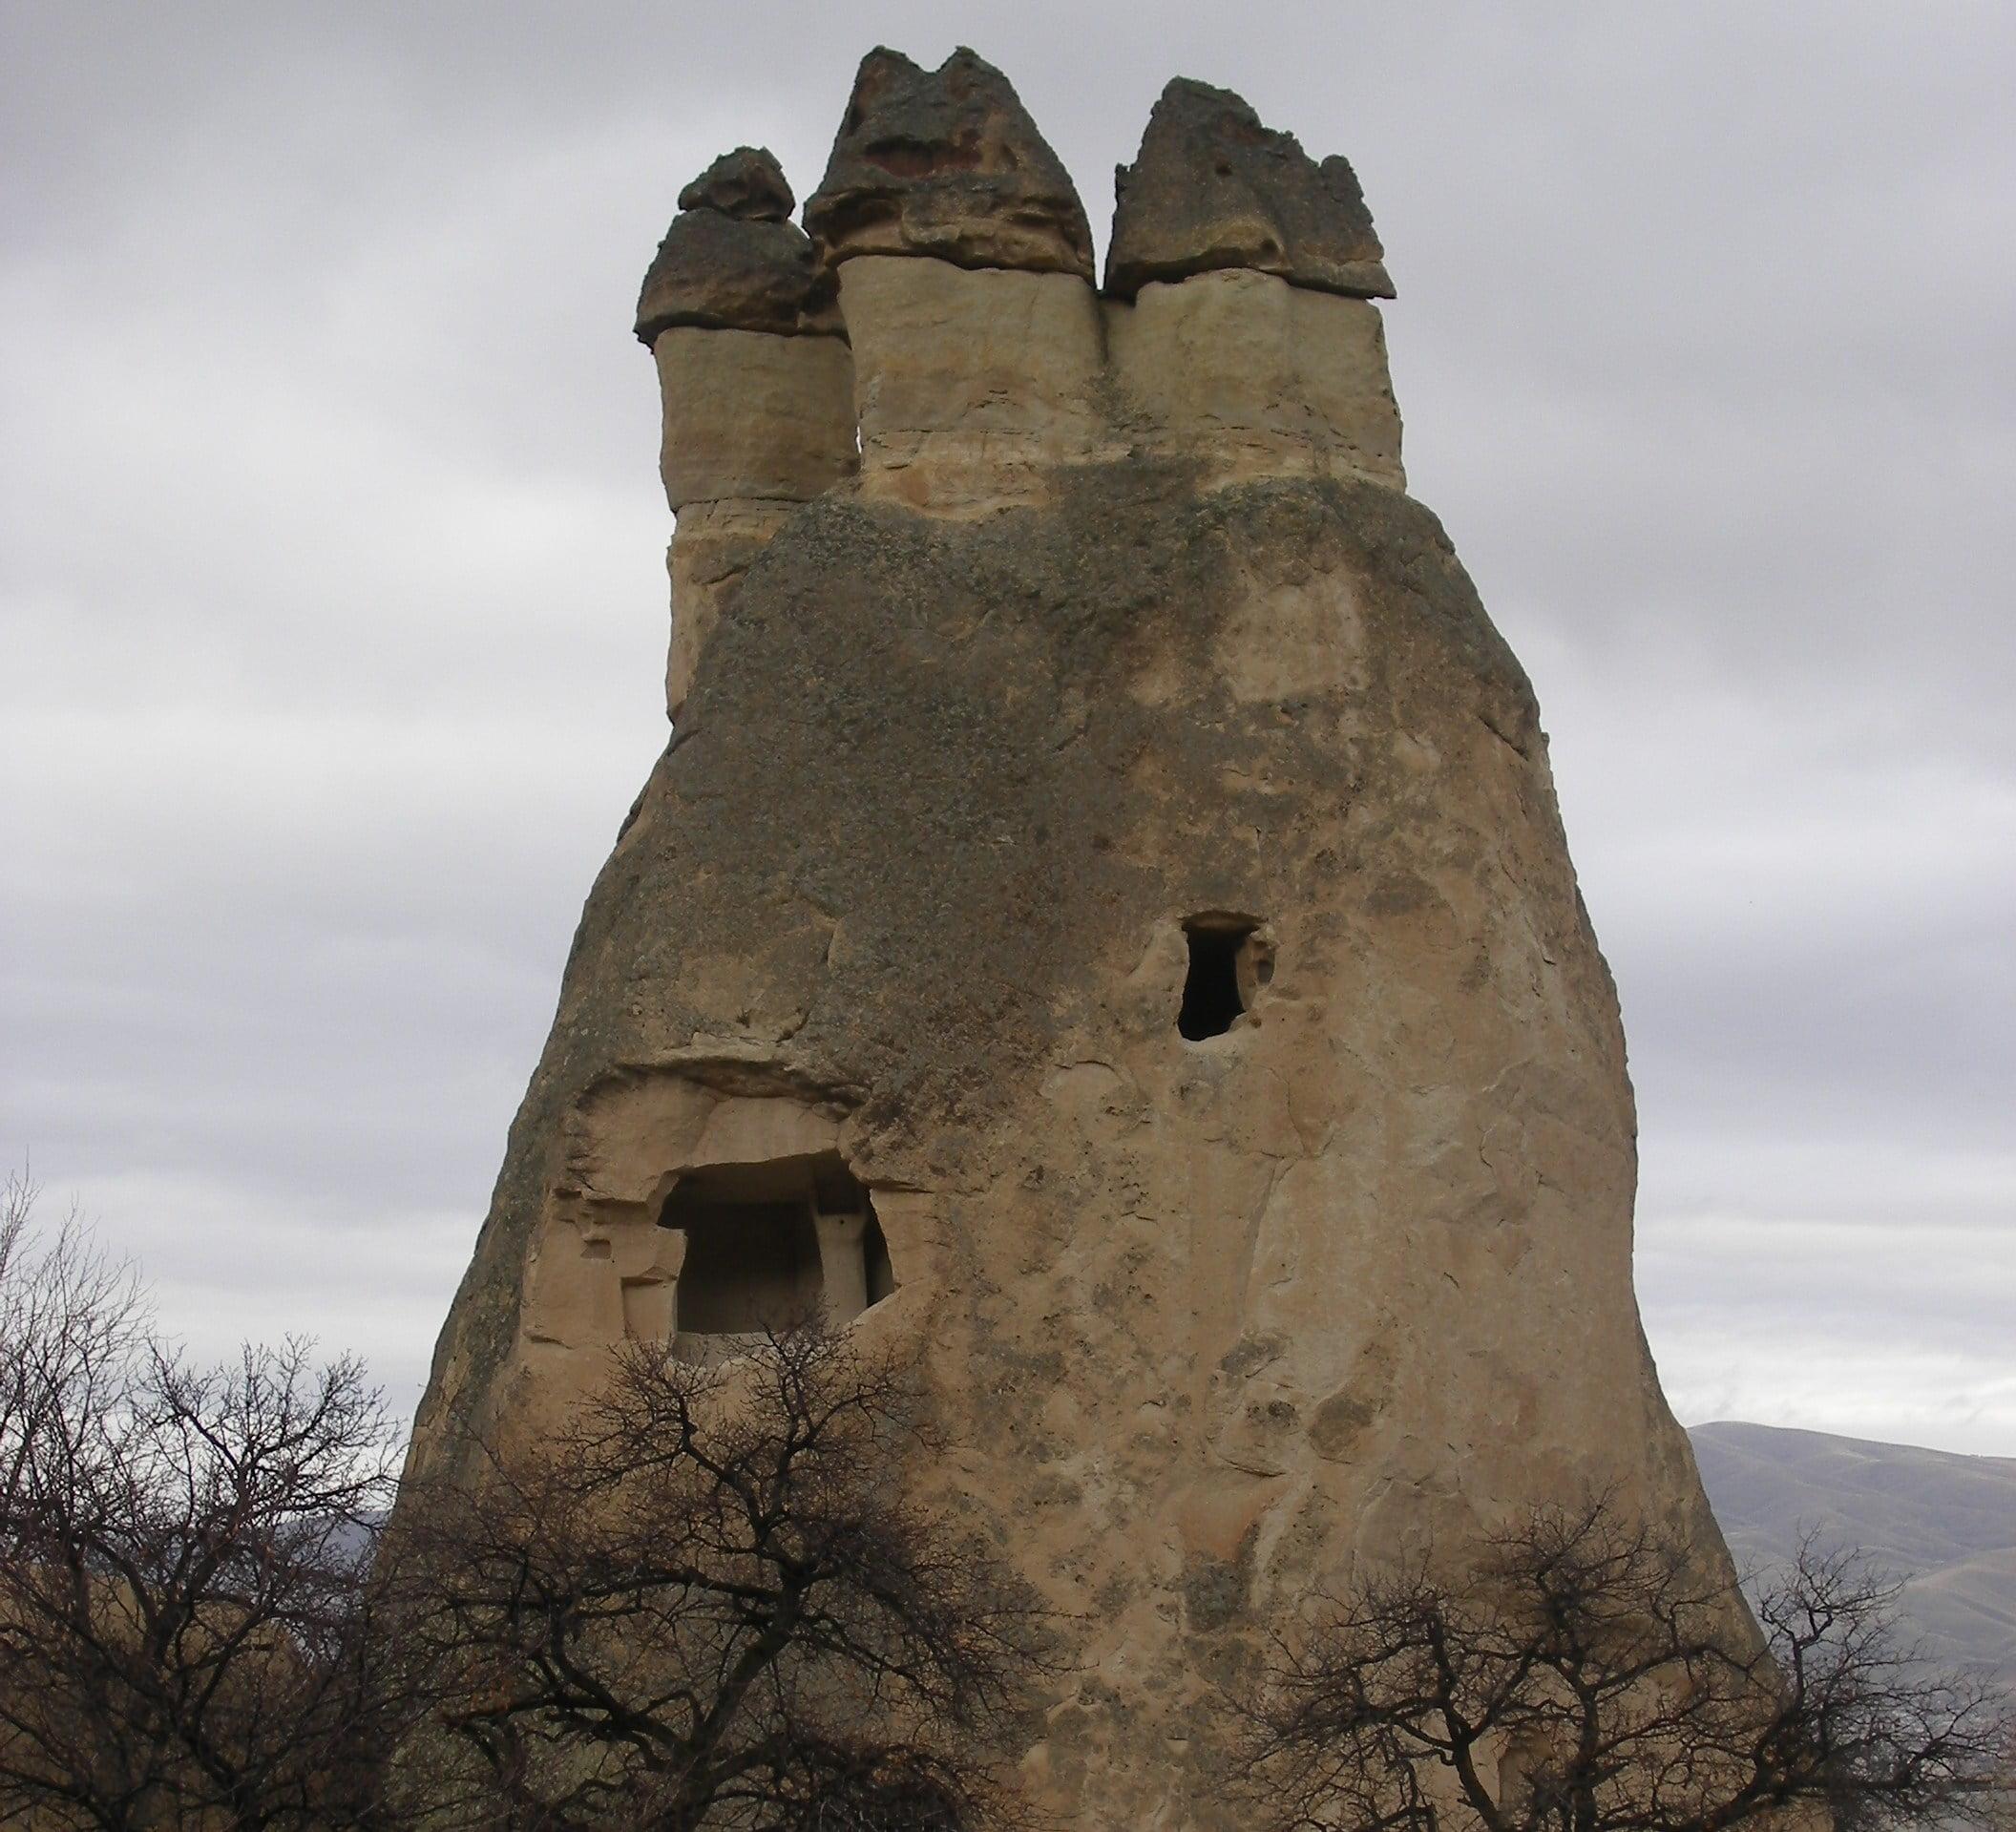 Chimeneas de las Hadas, Capadocia